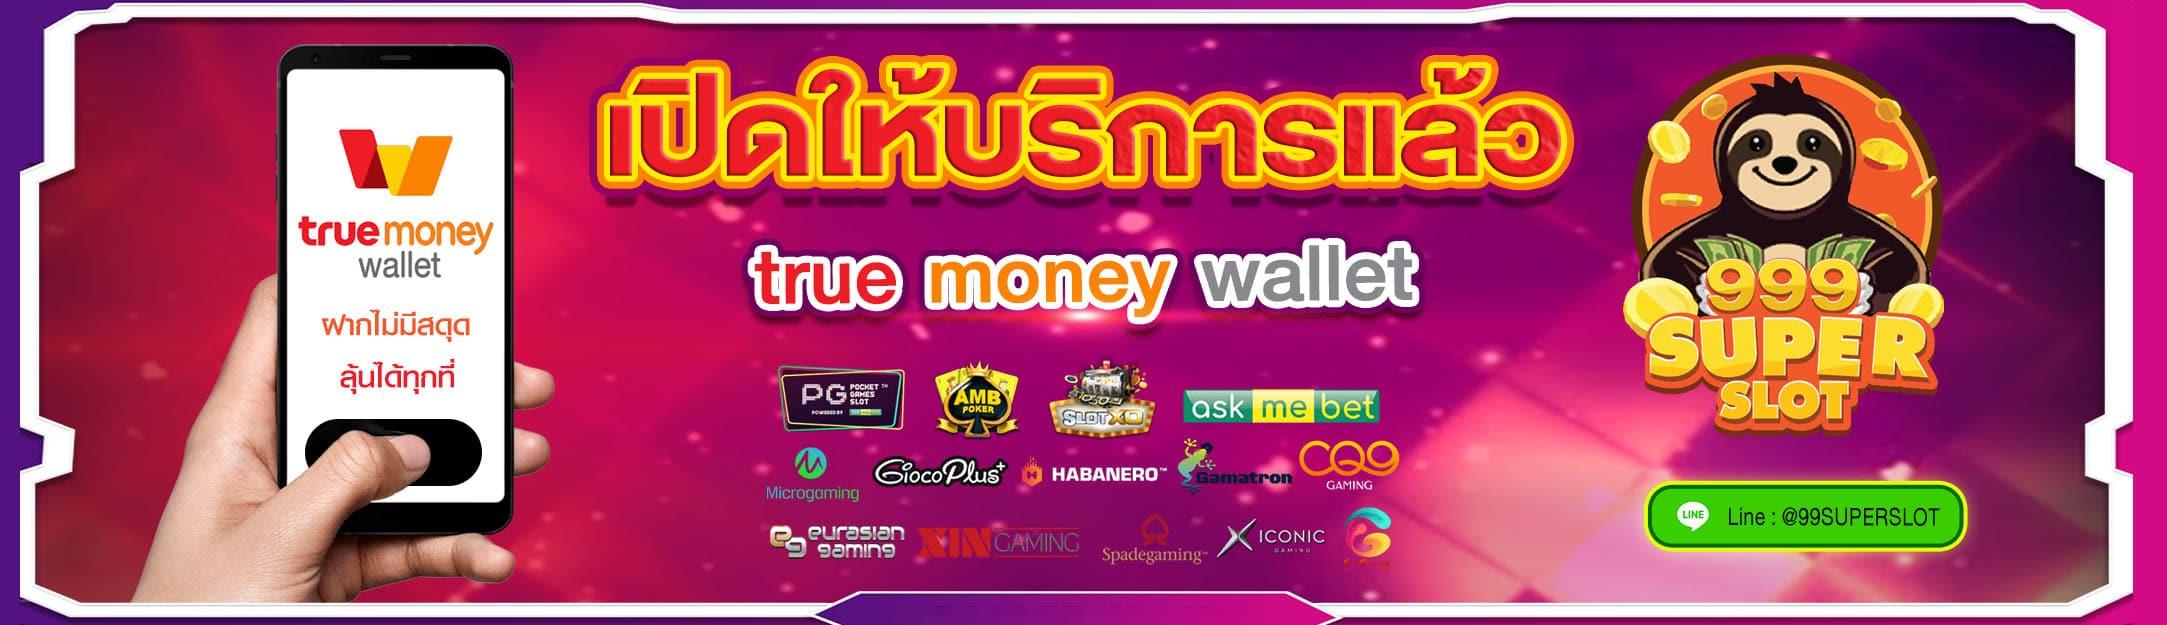 wallet 999superslot